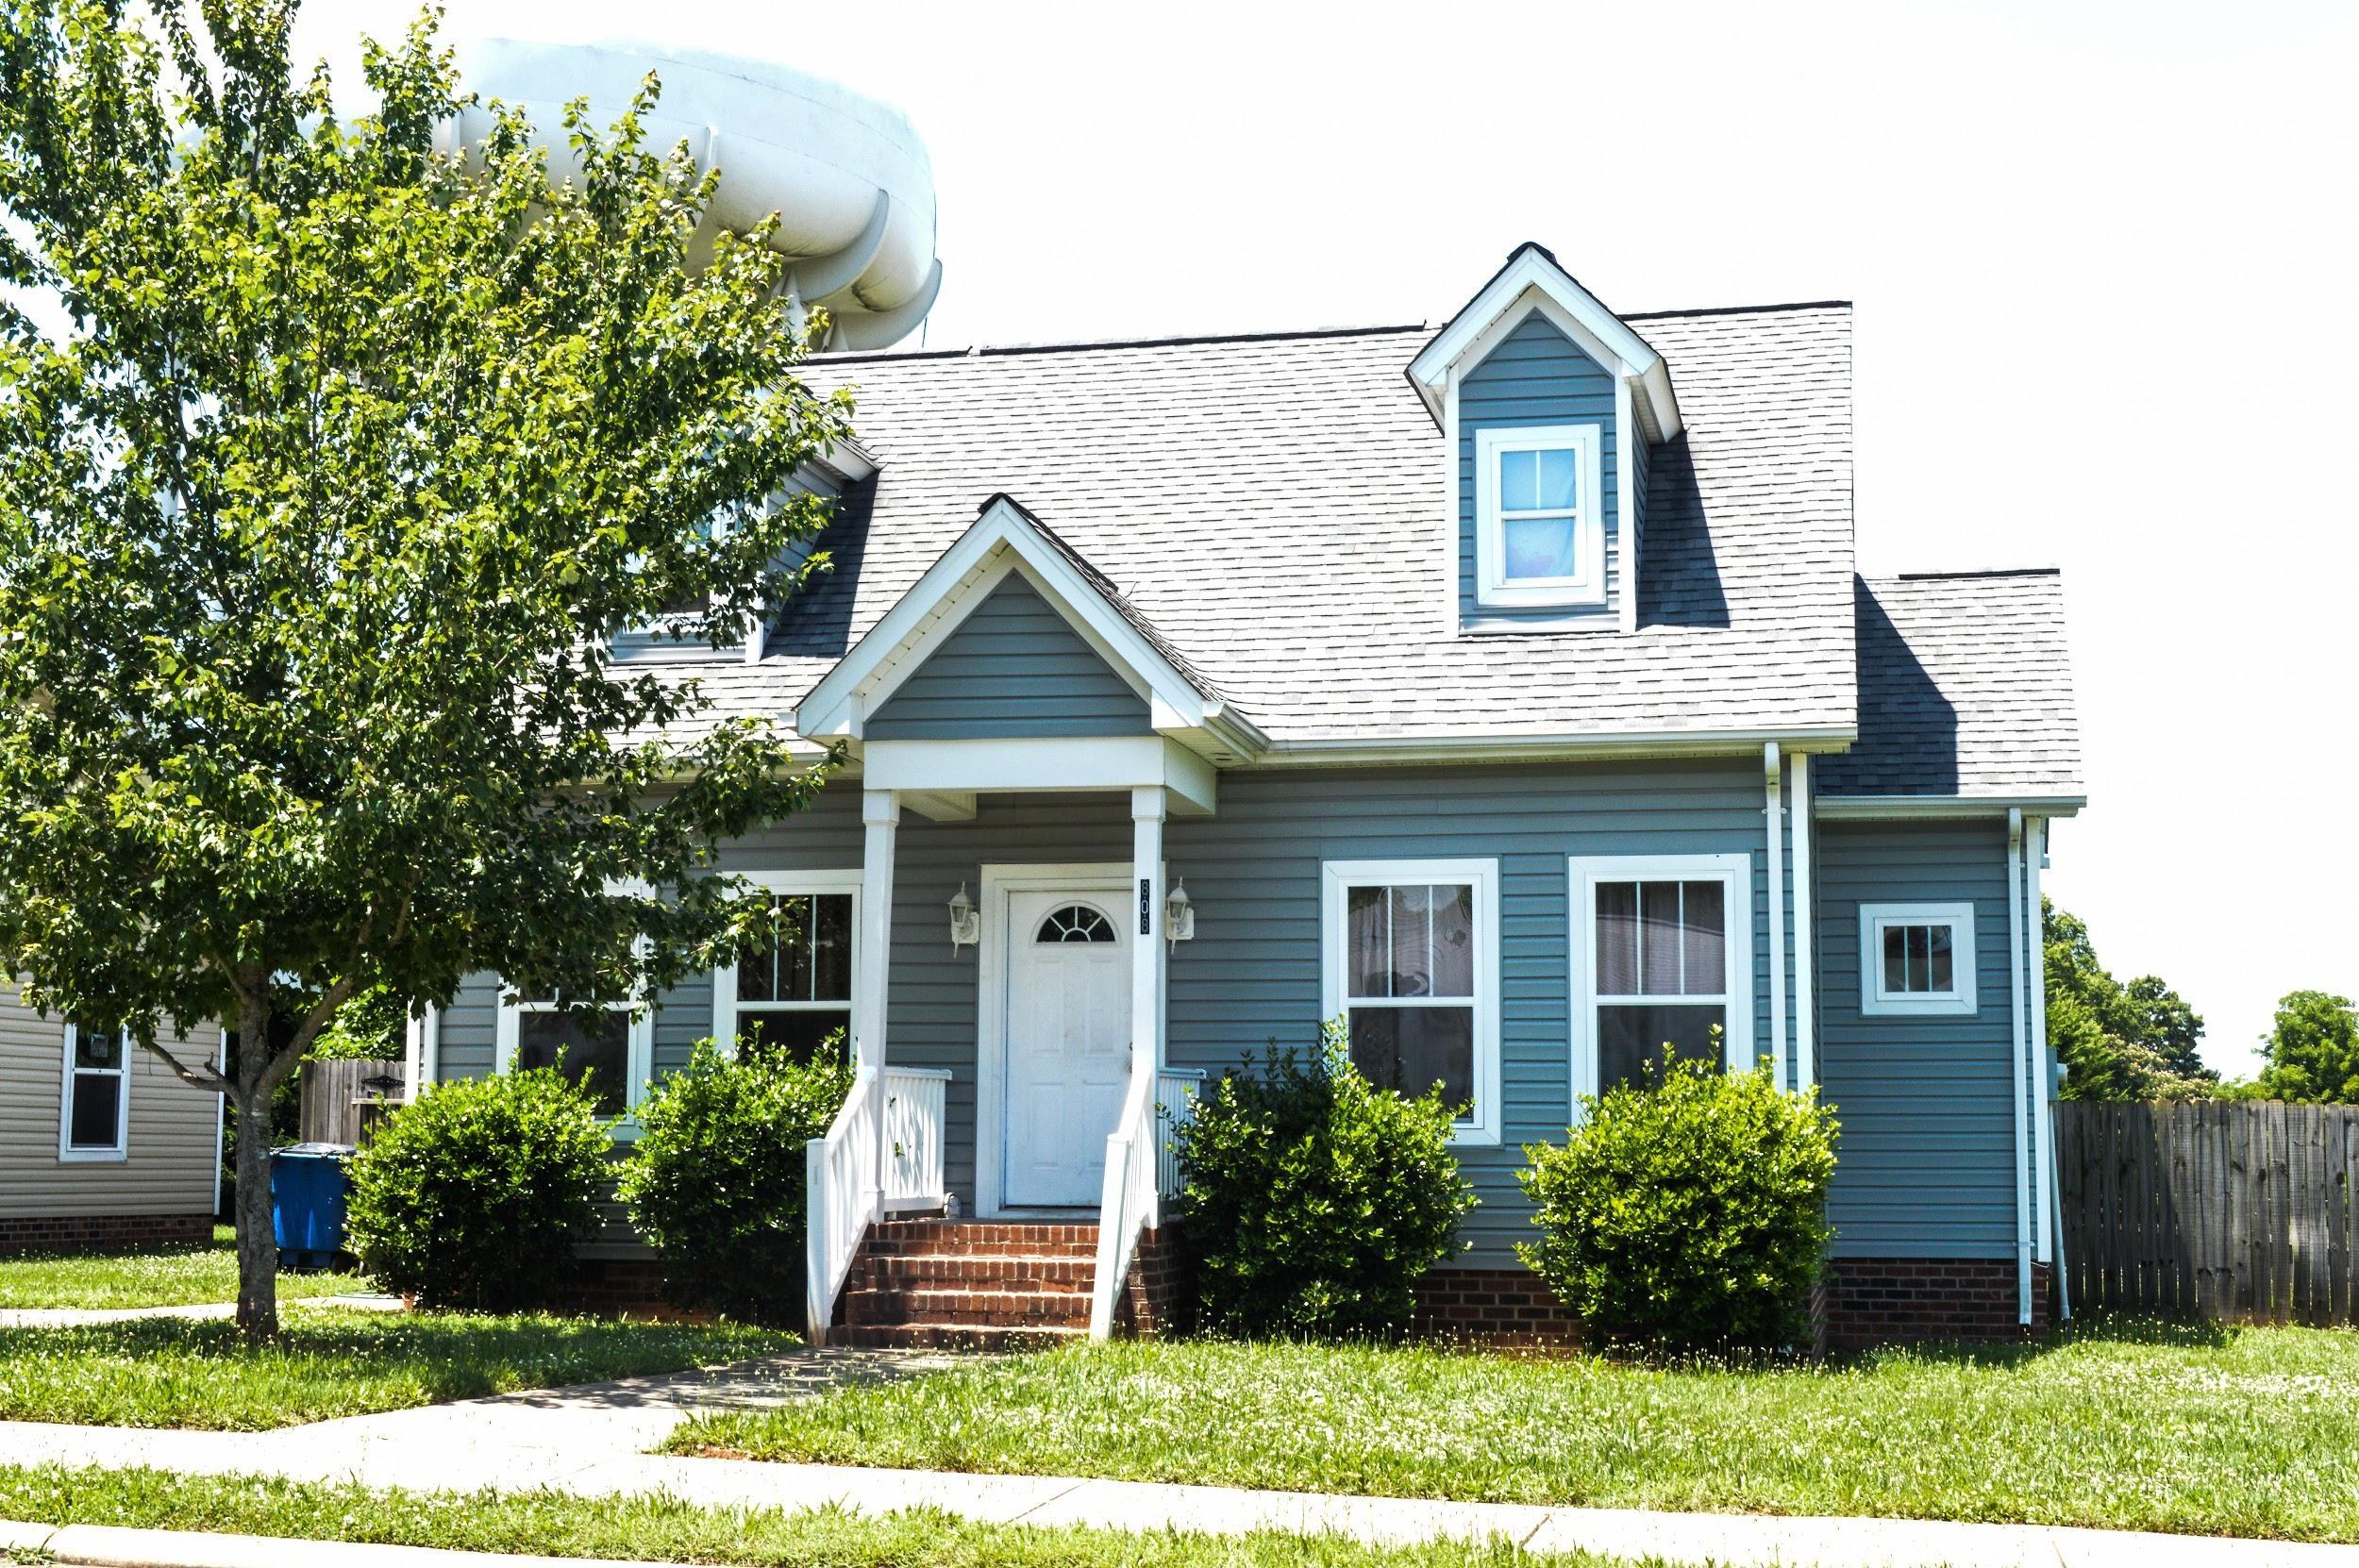 Residential Single Family Home - Statesville 28677